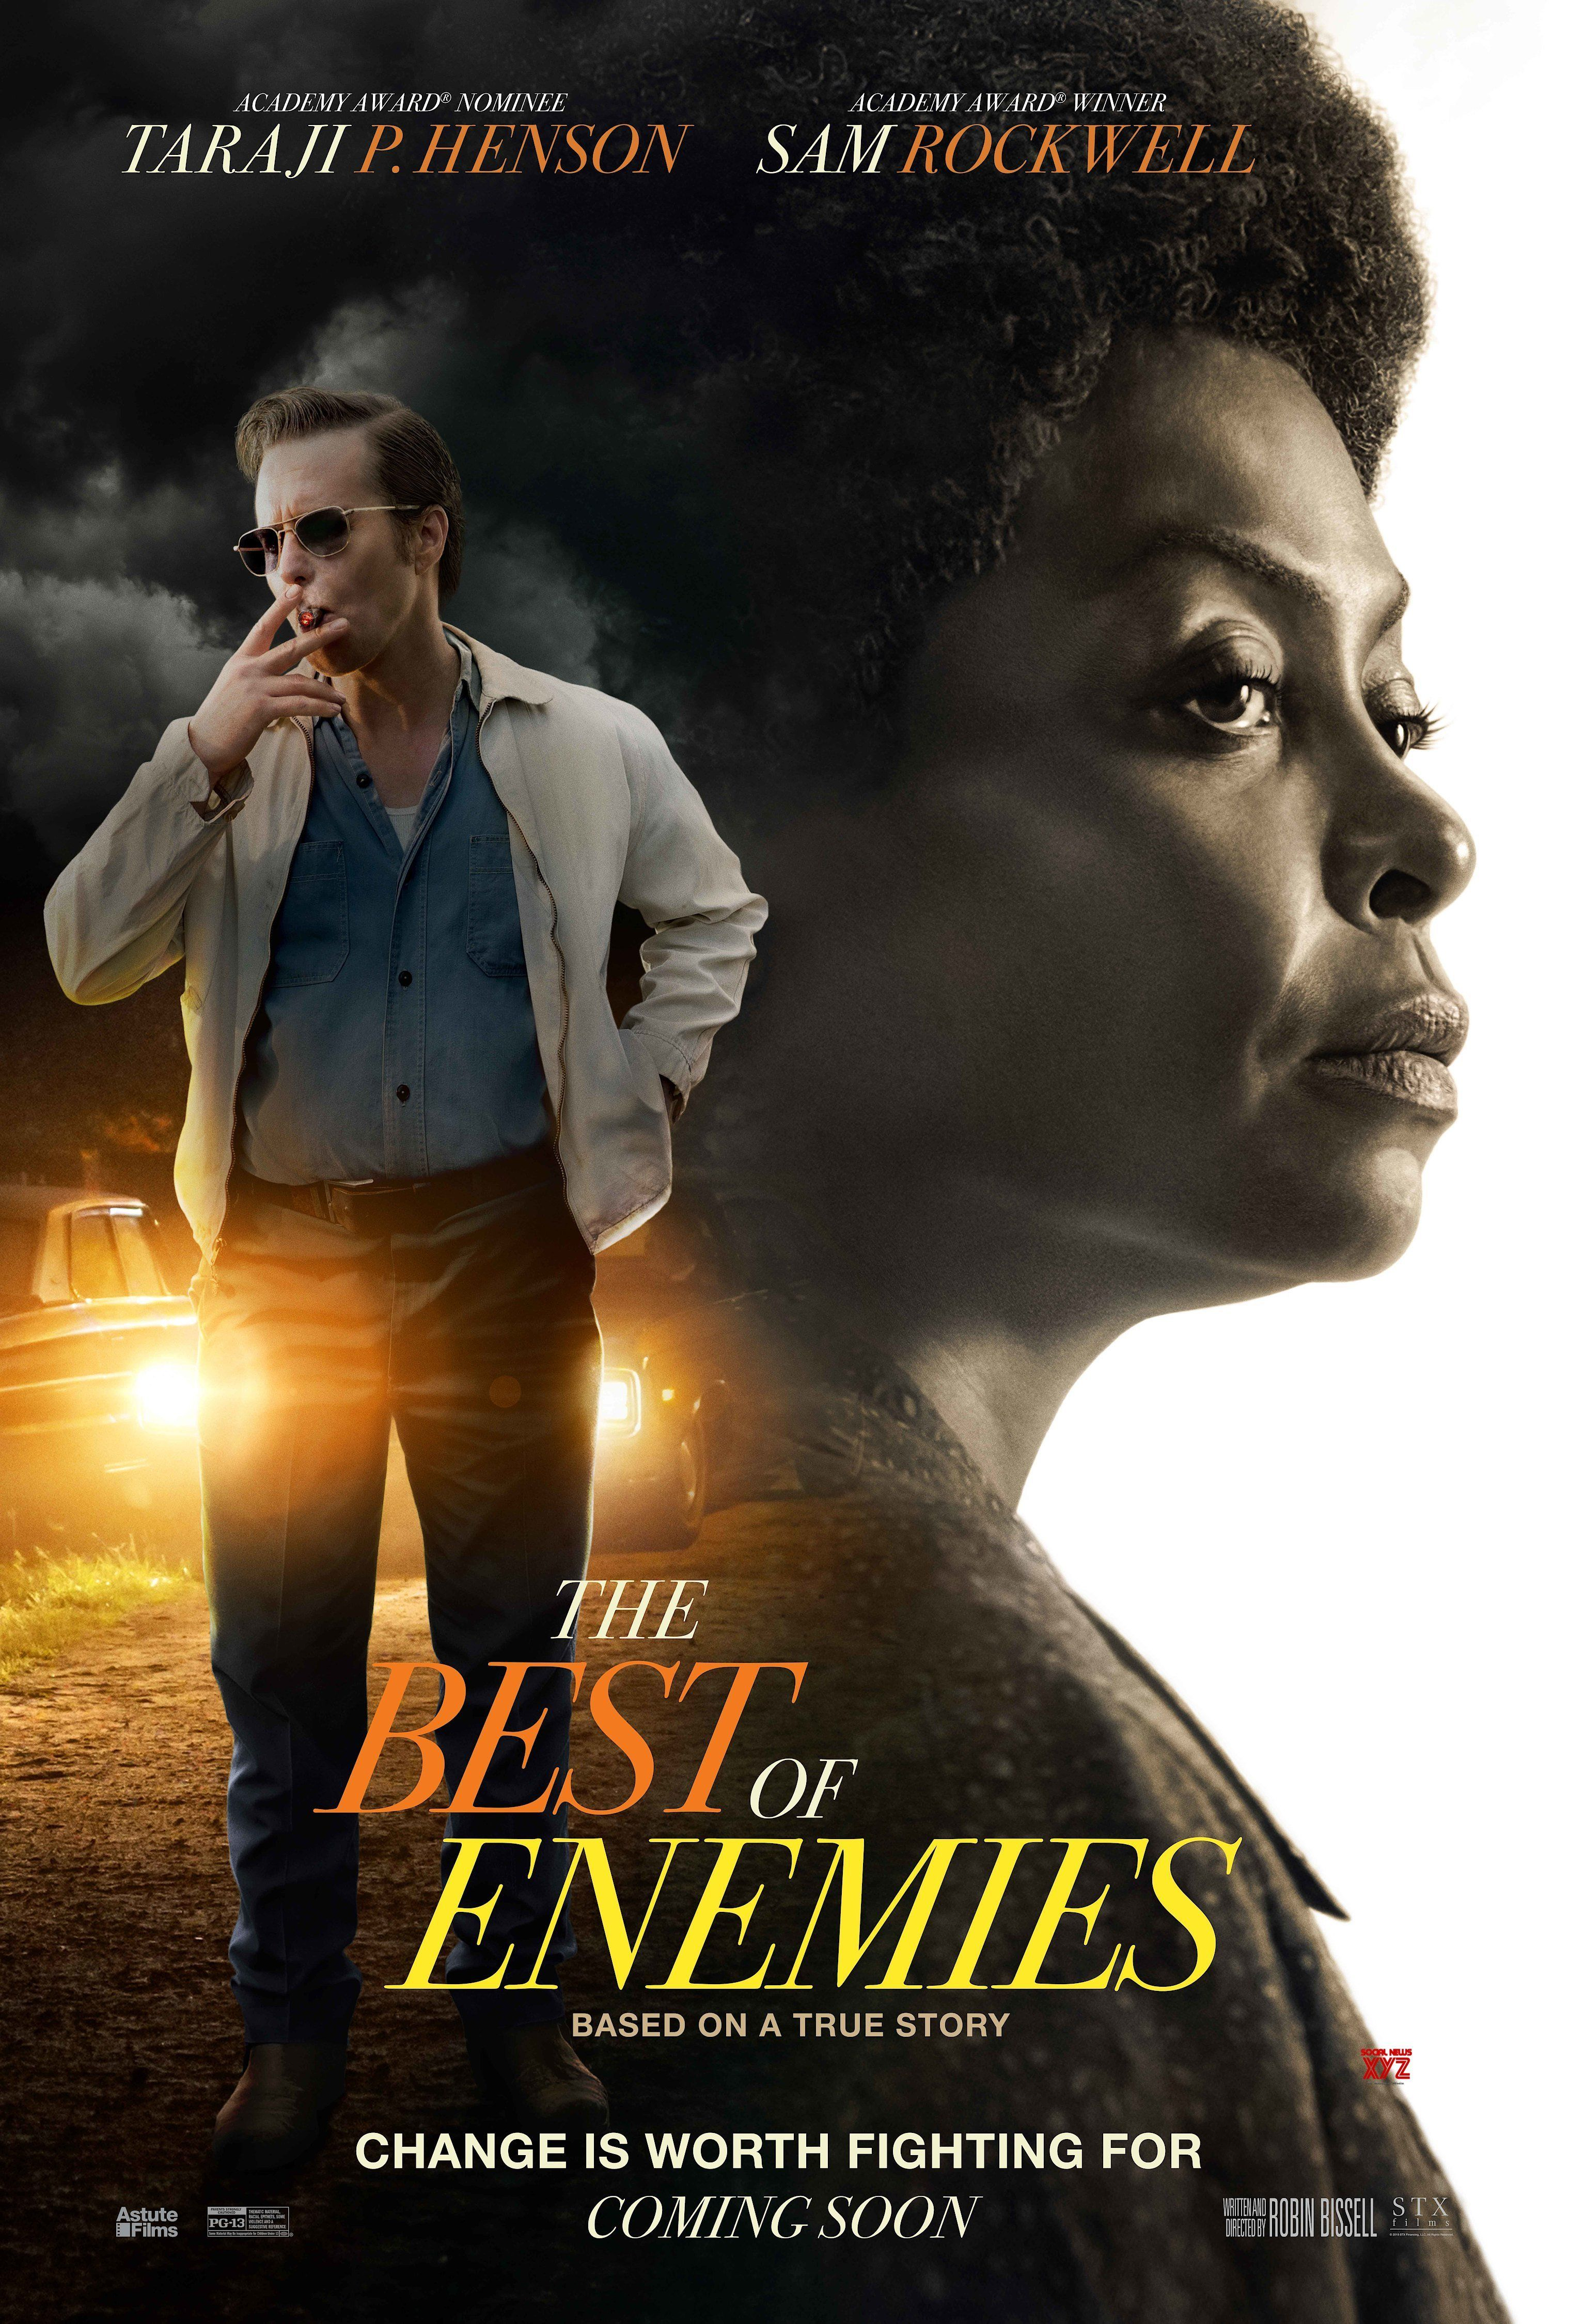 The Best Of Enemies Movie Hd Posters Social News Xyz Filmes Completos Filmes Online Gratis Filmes